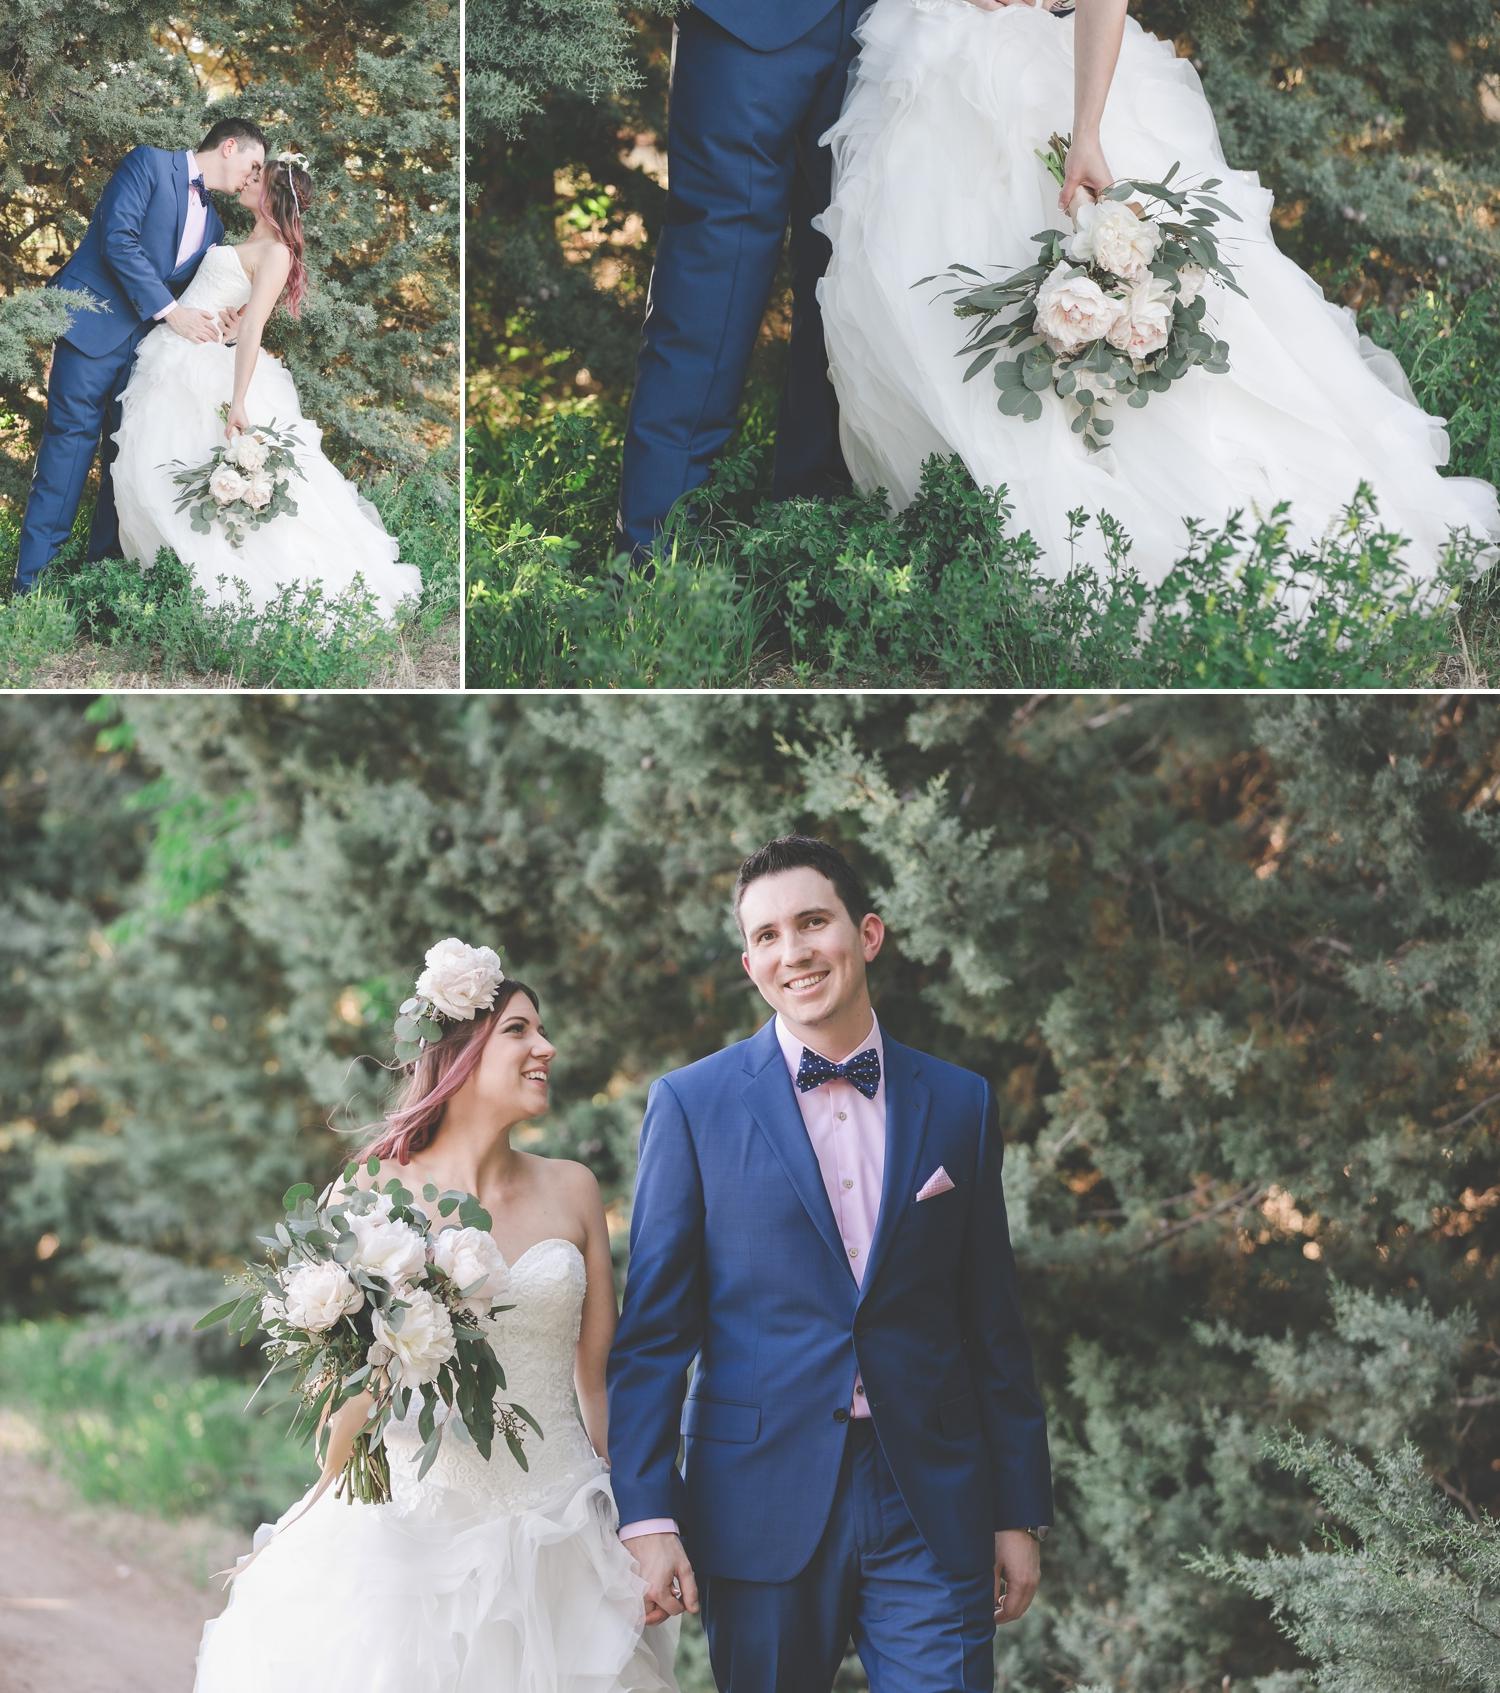 emery inman wedding 5.jpg